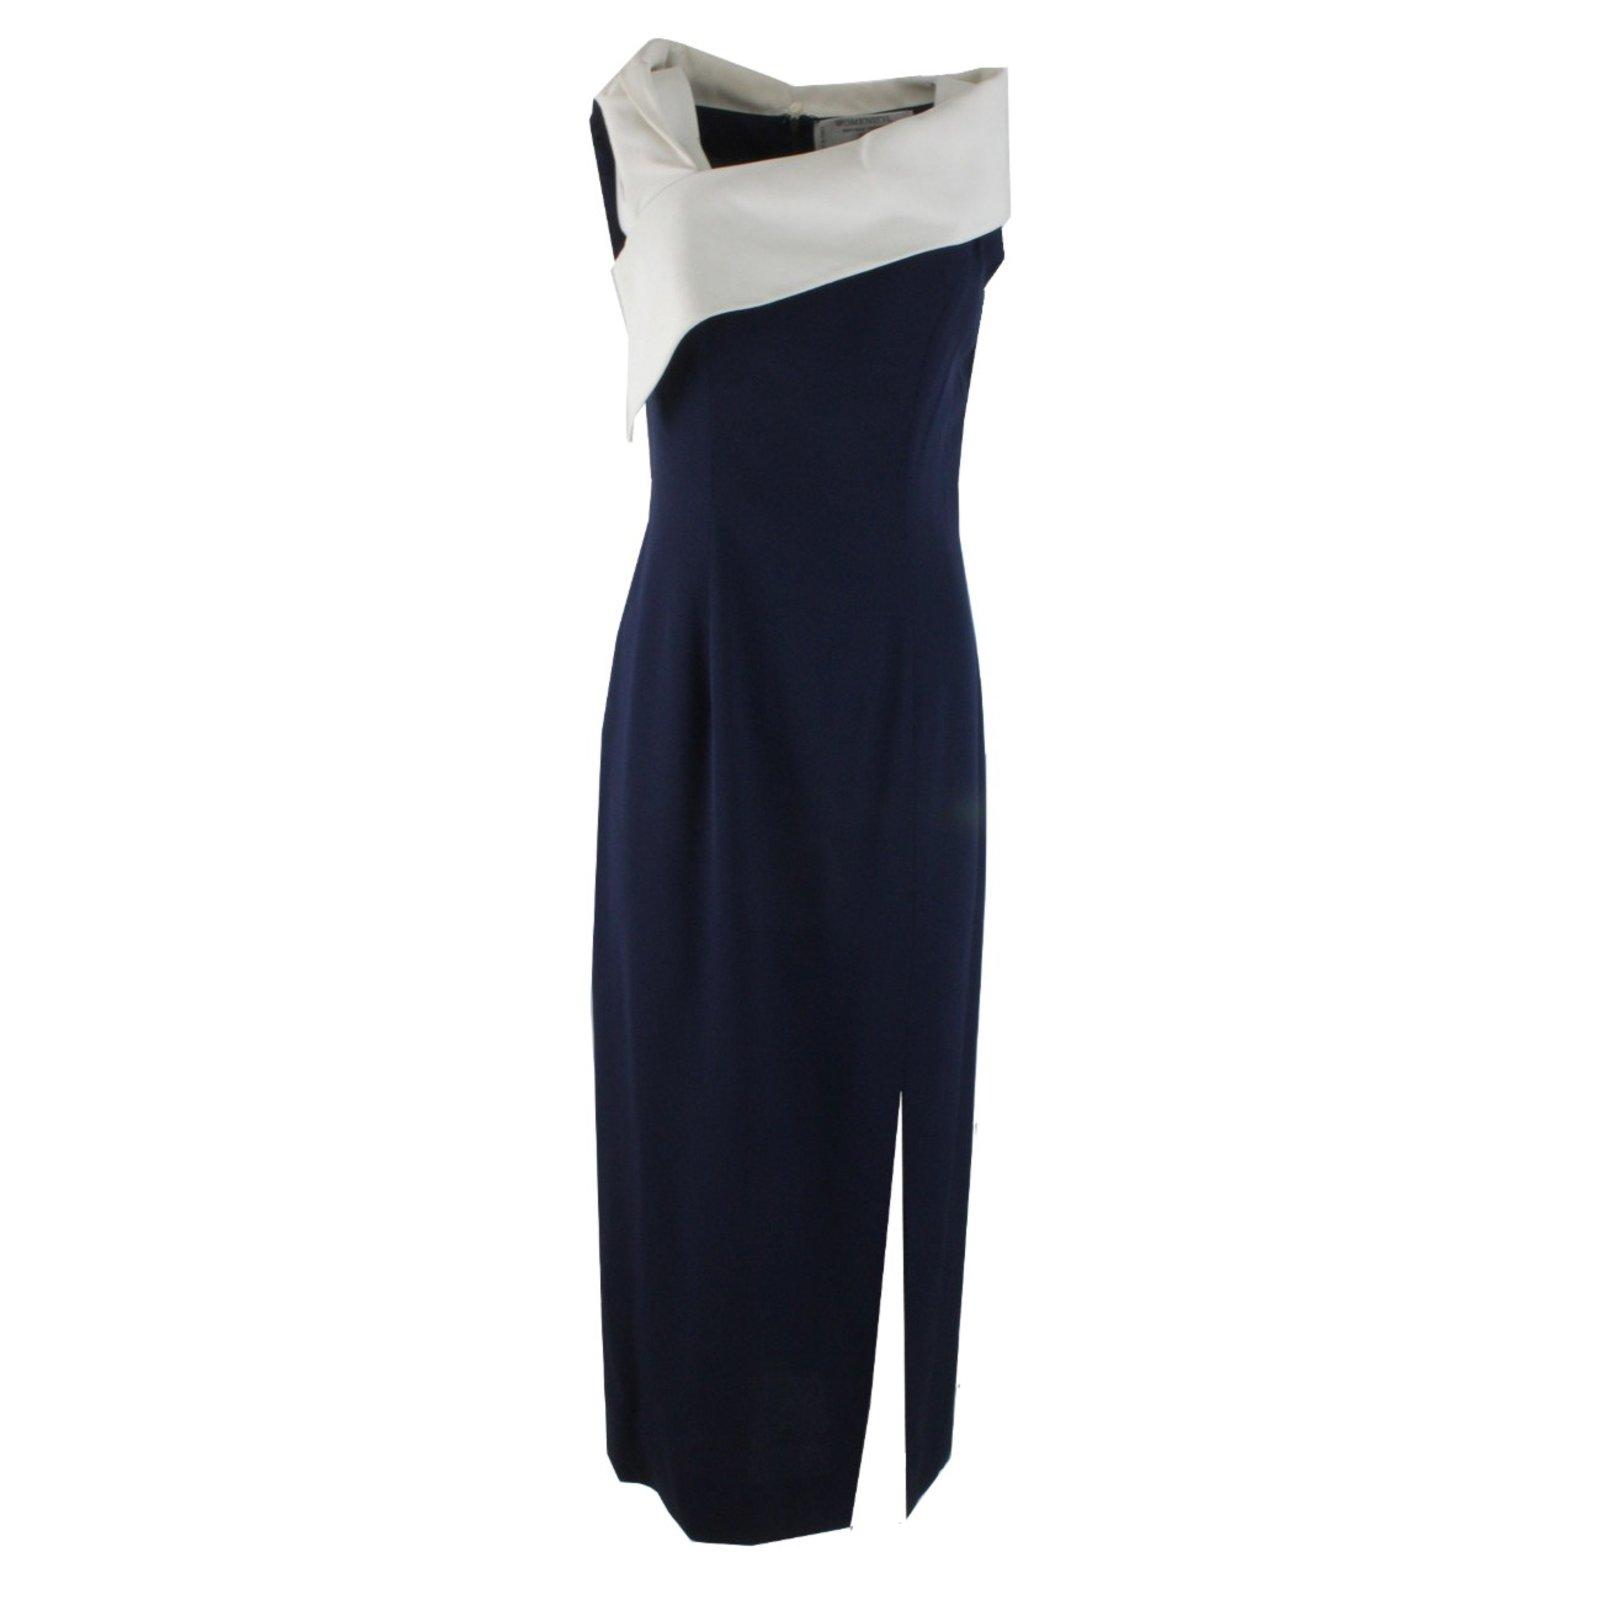 Robes Womenstyl Robe Longue Soie Polyester Viscose Acetate Blanc Bleu Ref 5257 Joli Closet